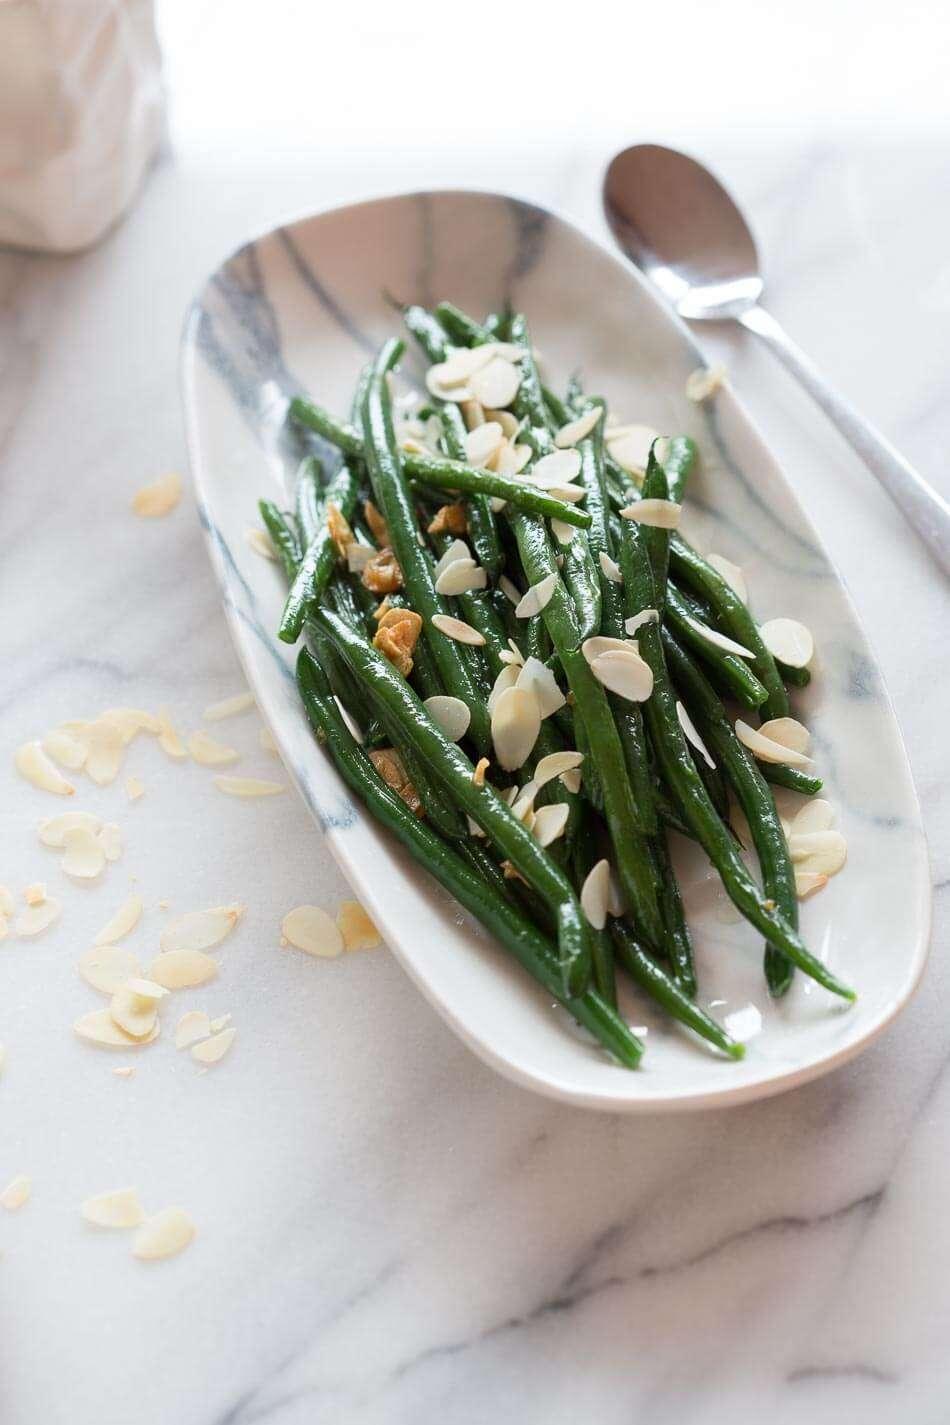 Garlic green beans with almonds slivers | insimoneskitchen.com